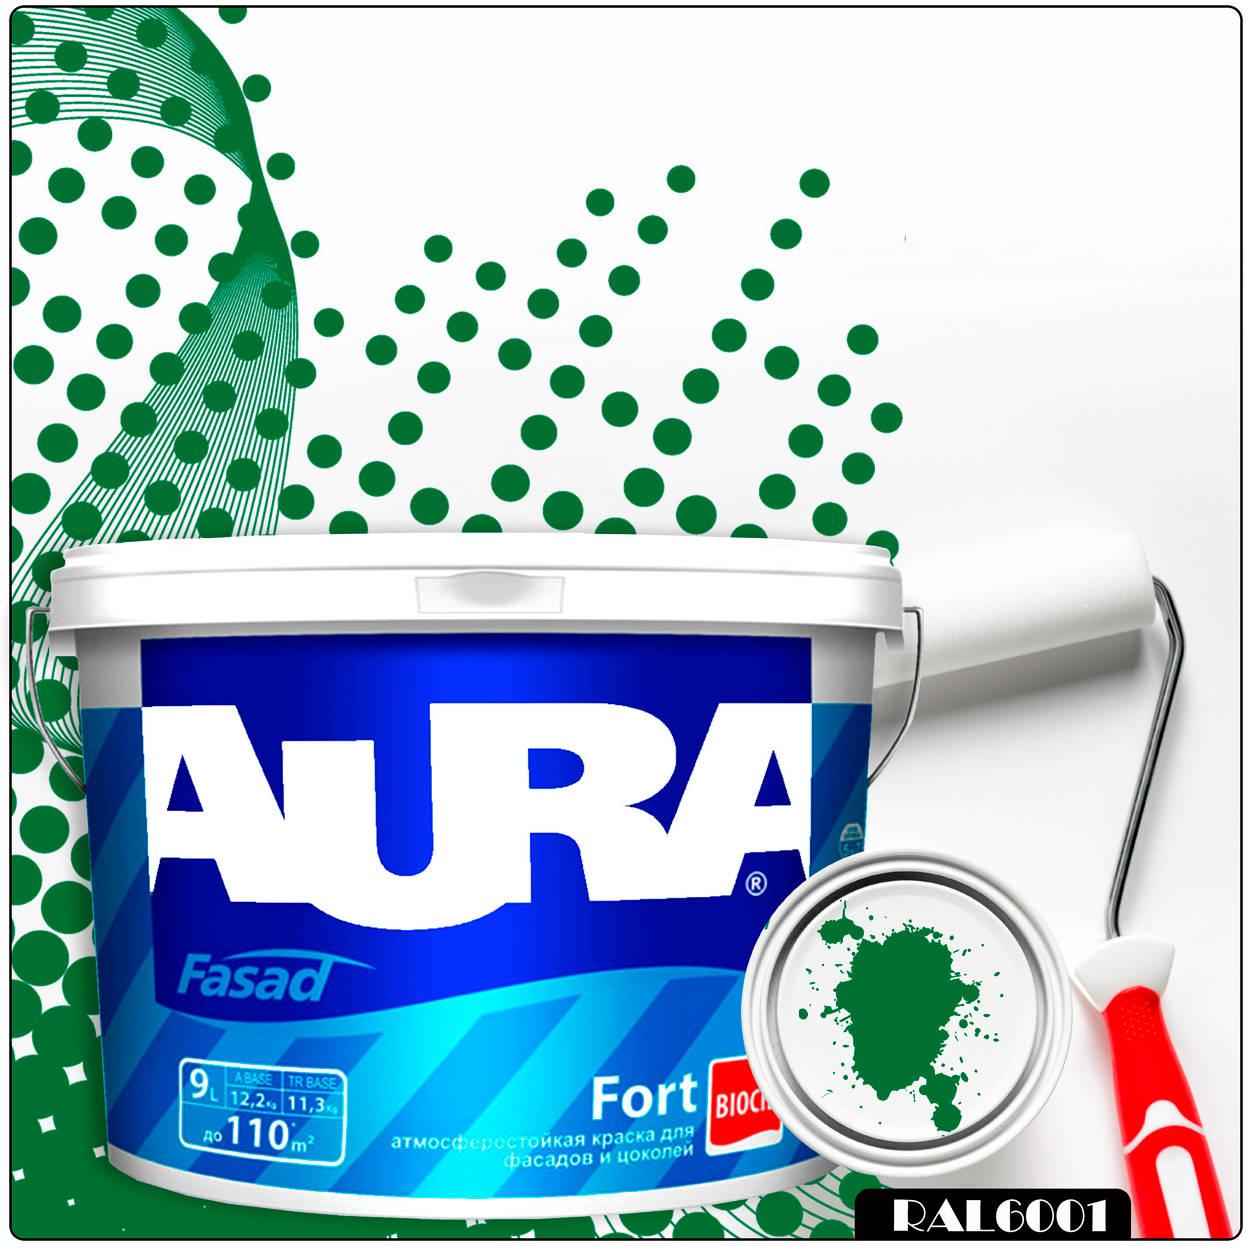 Фото 2 - Краска Aura Fasad Fort, RAL 6001 Зеленый изумруд, латексная, матовая, для фасада и цоколей, 9л, Аура.